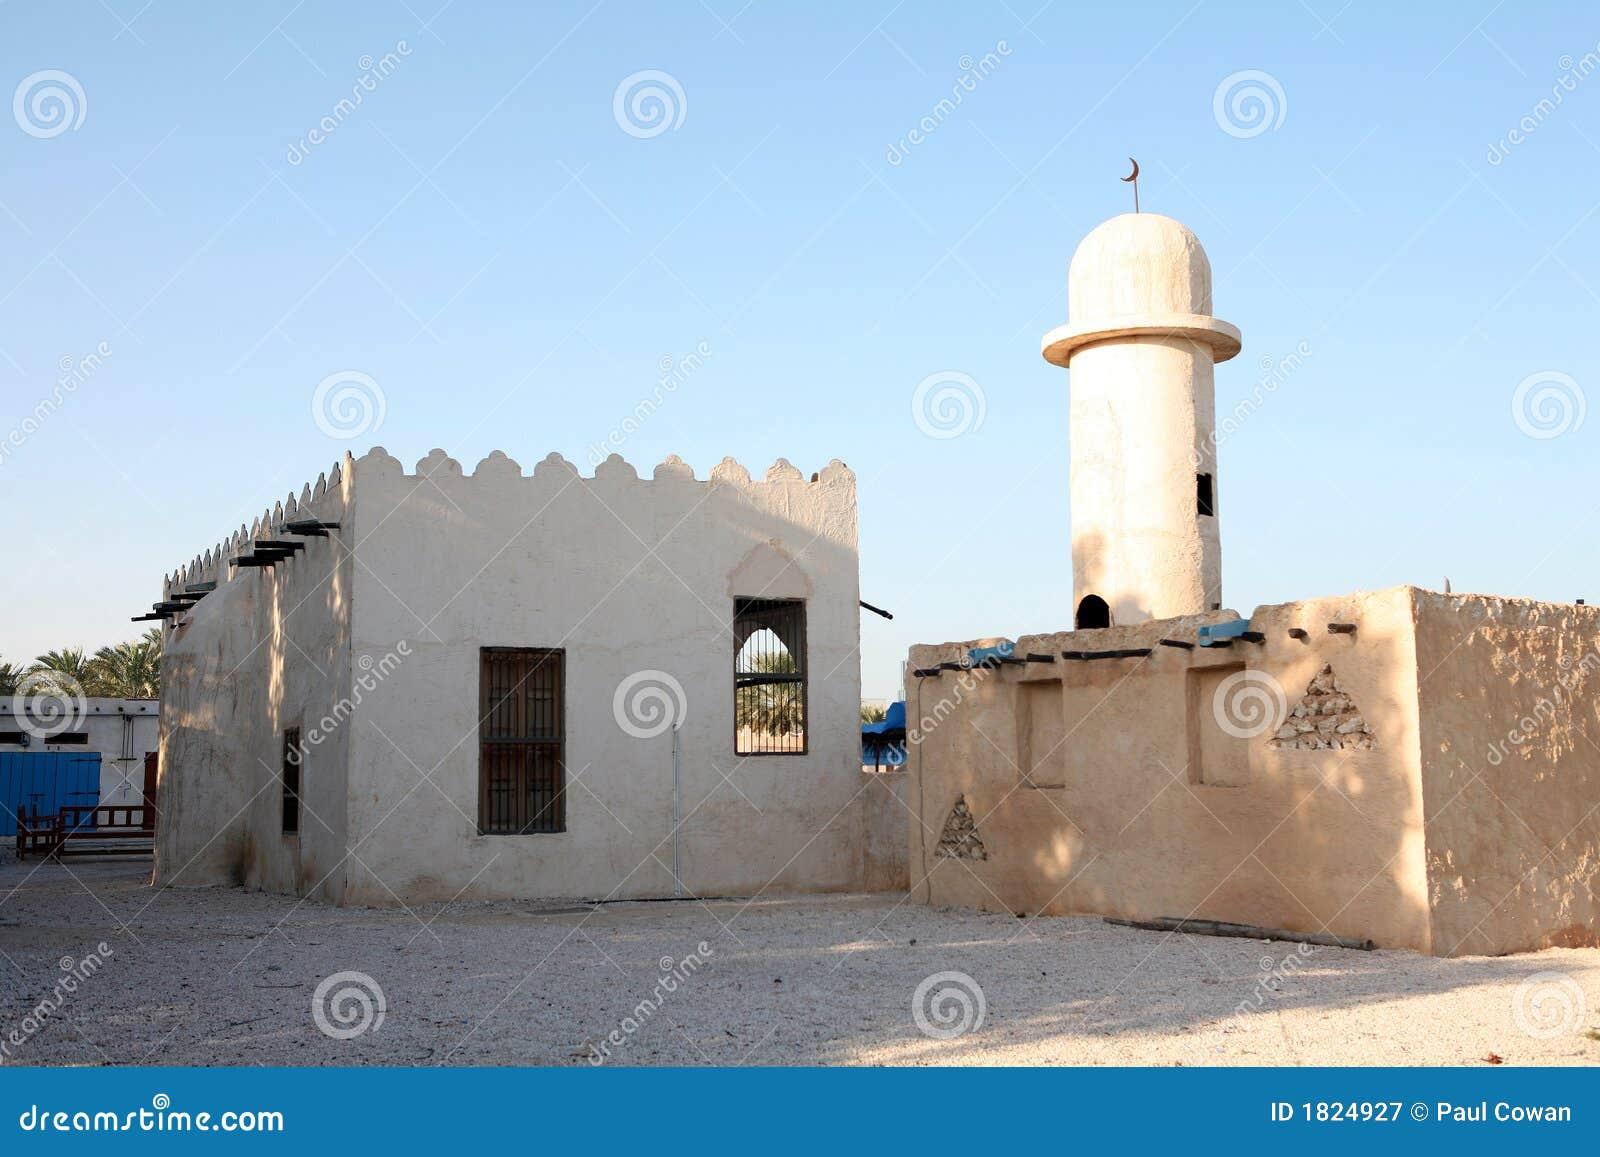 Arabische dorpsmoskee